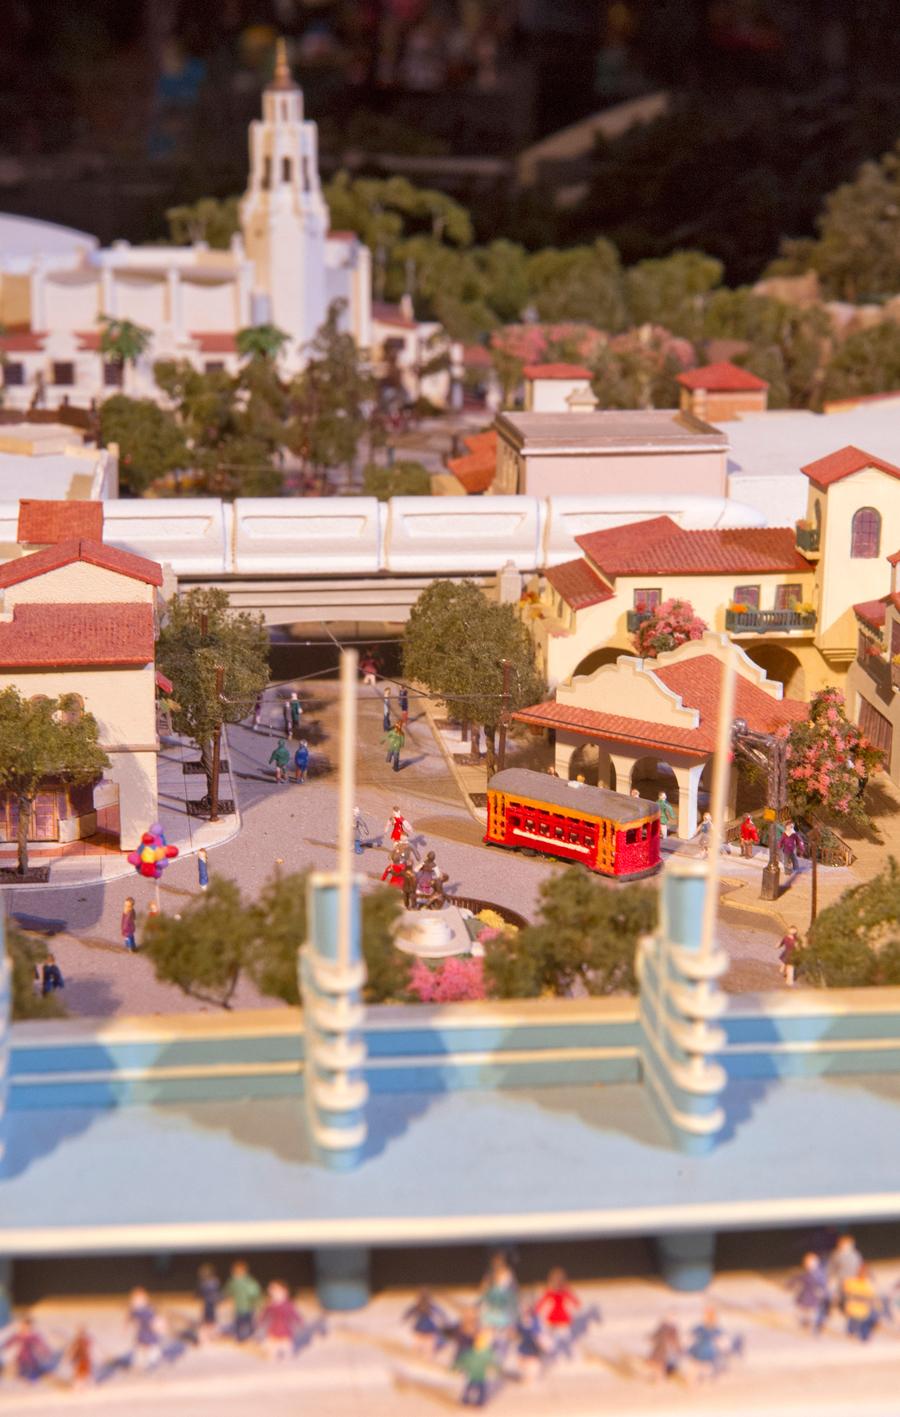 [Disney California Adventure] Placemaking: Pixar Pier, Buena Vista Street, Hollywood Land, Condor Flats - Page 16 9ndm123234LARGE